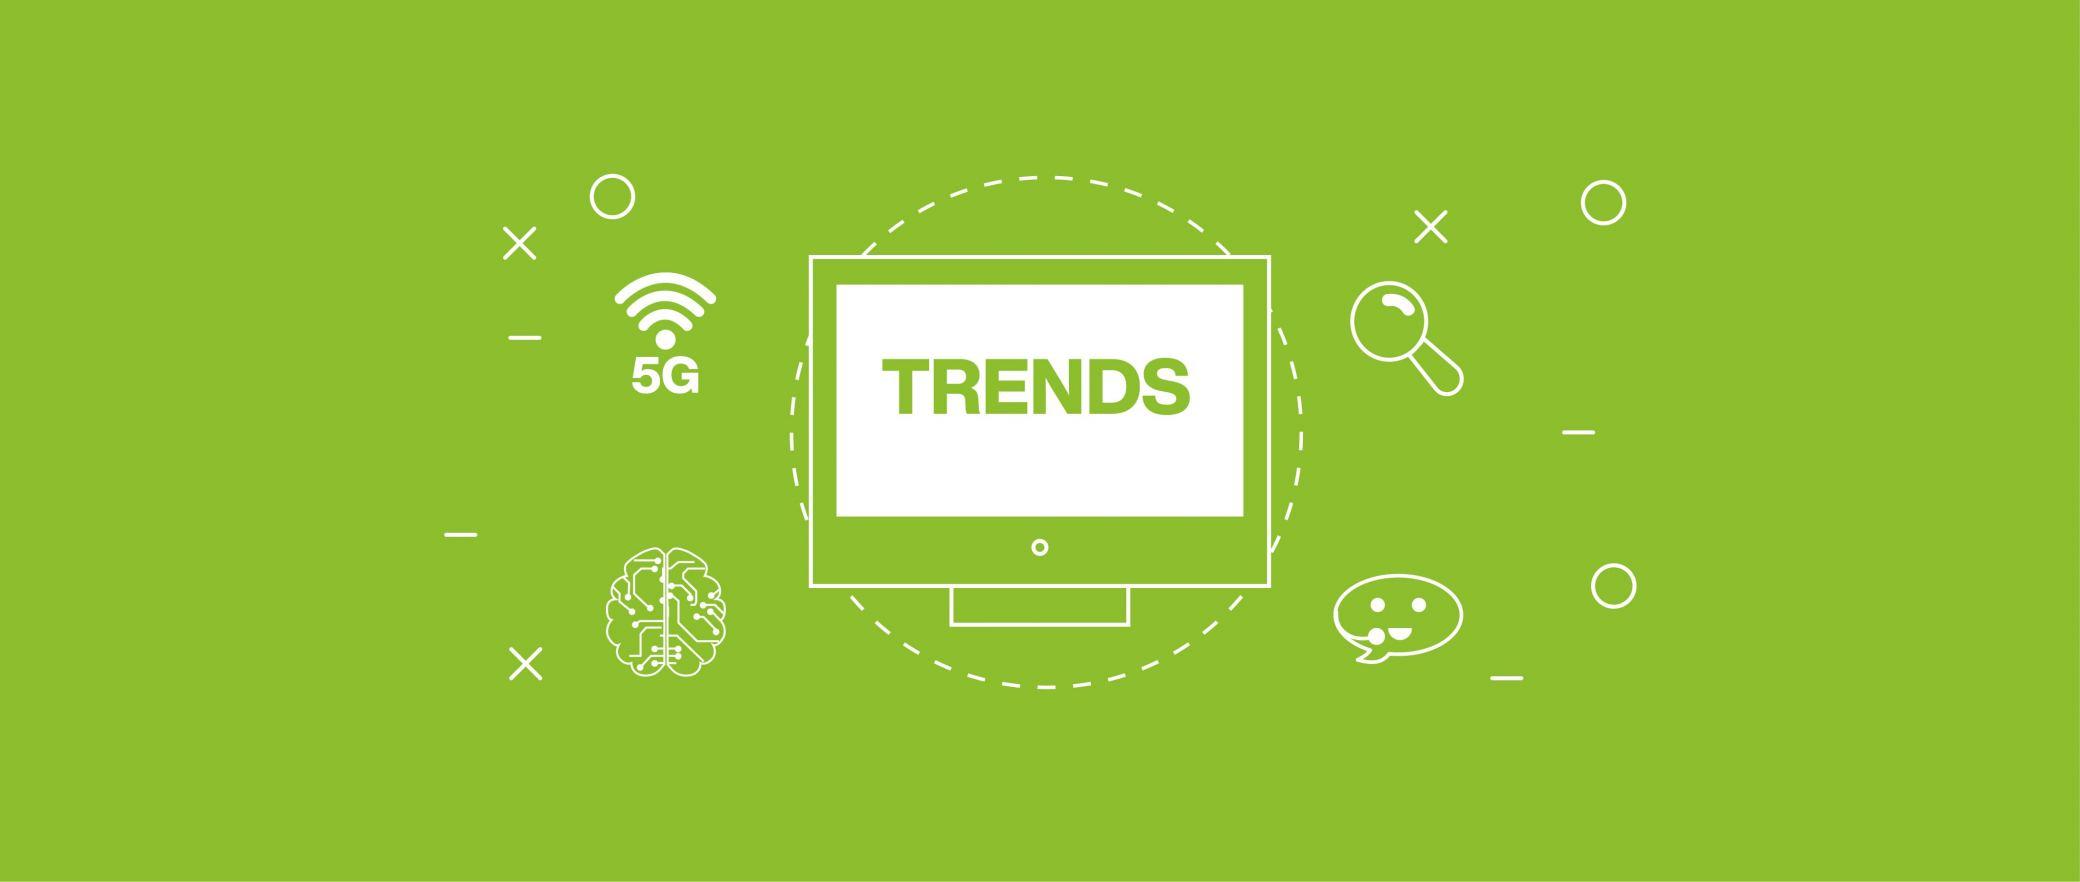 le tendenze del mondo software 2020